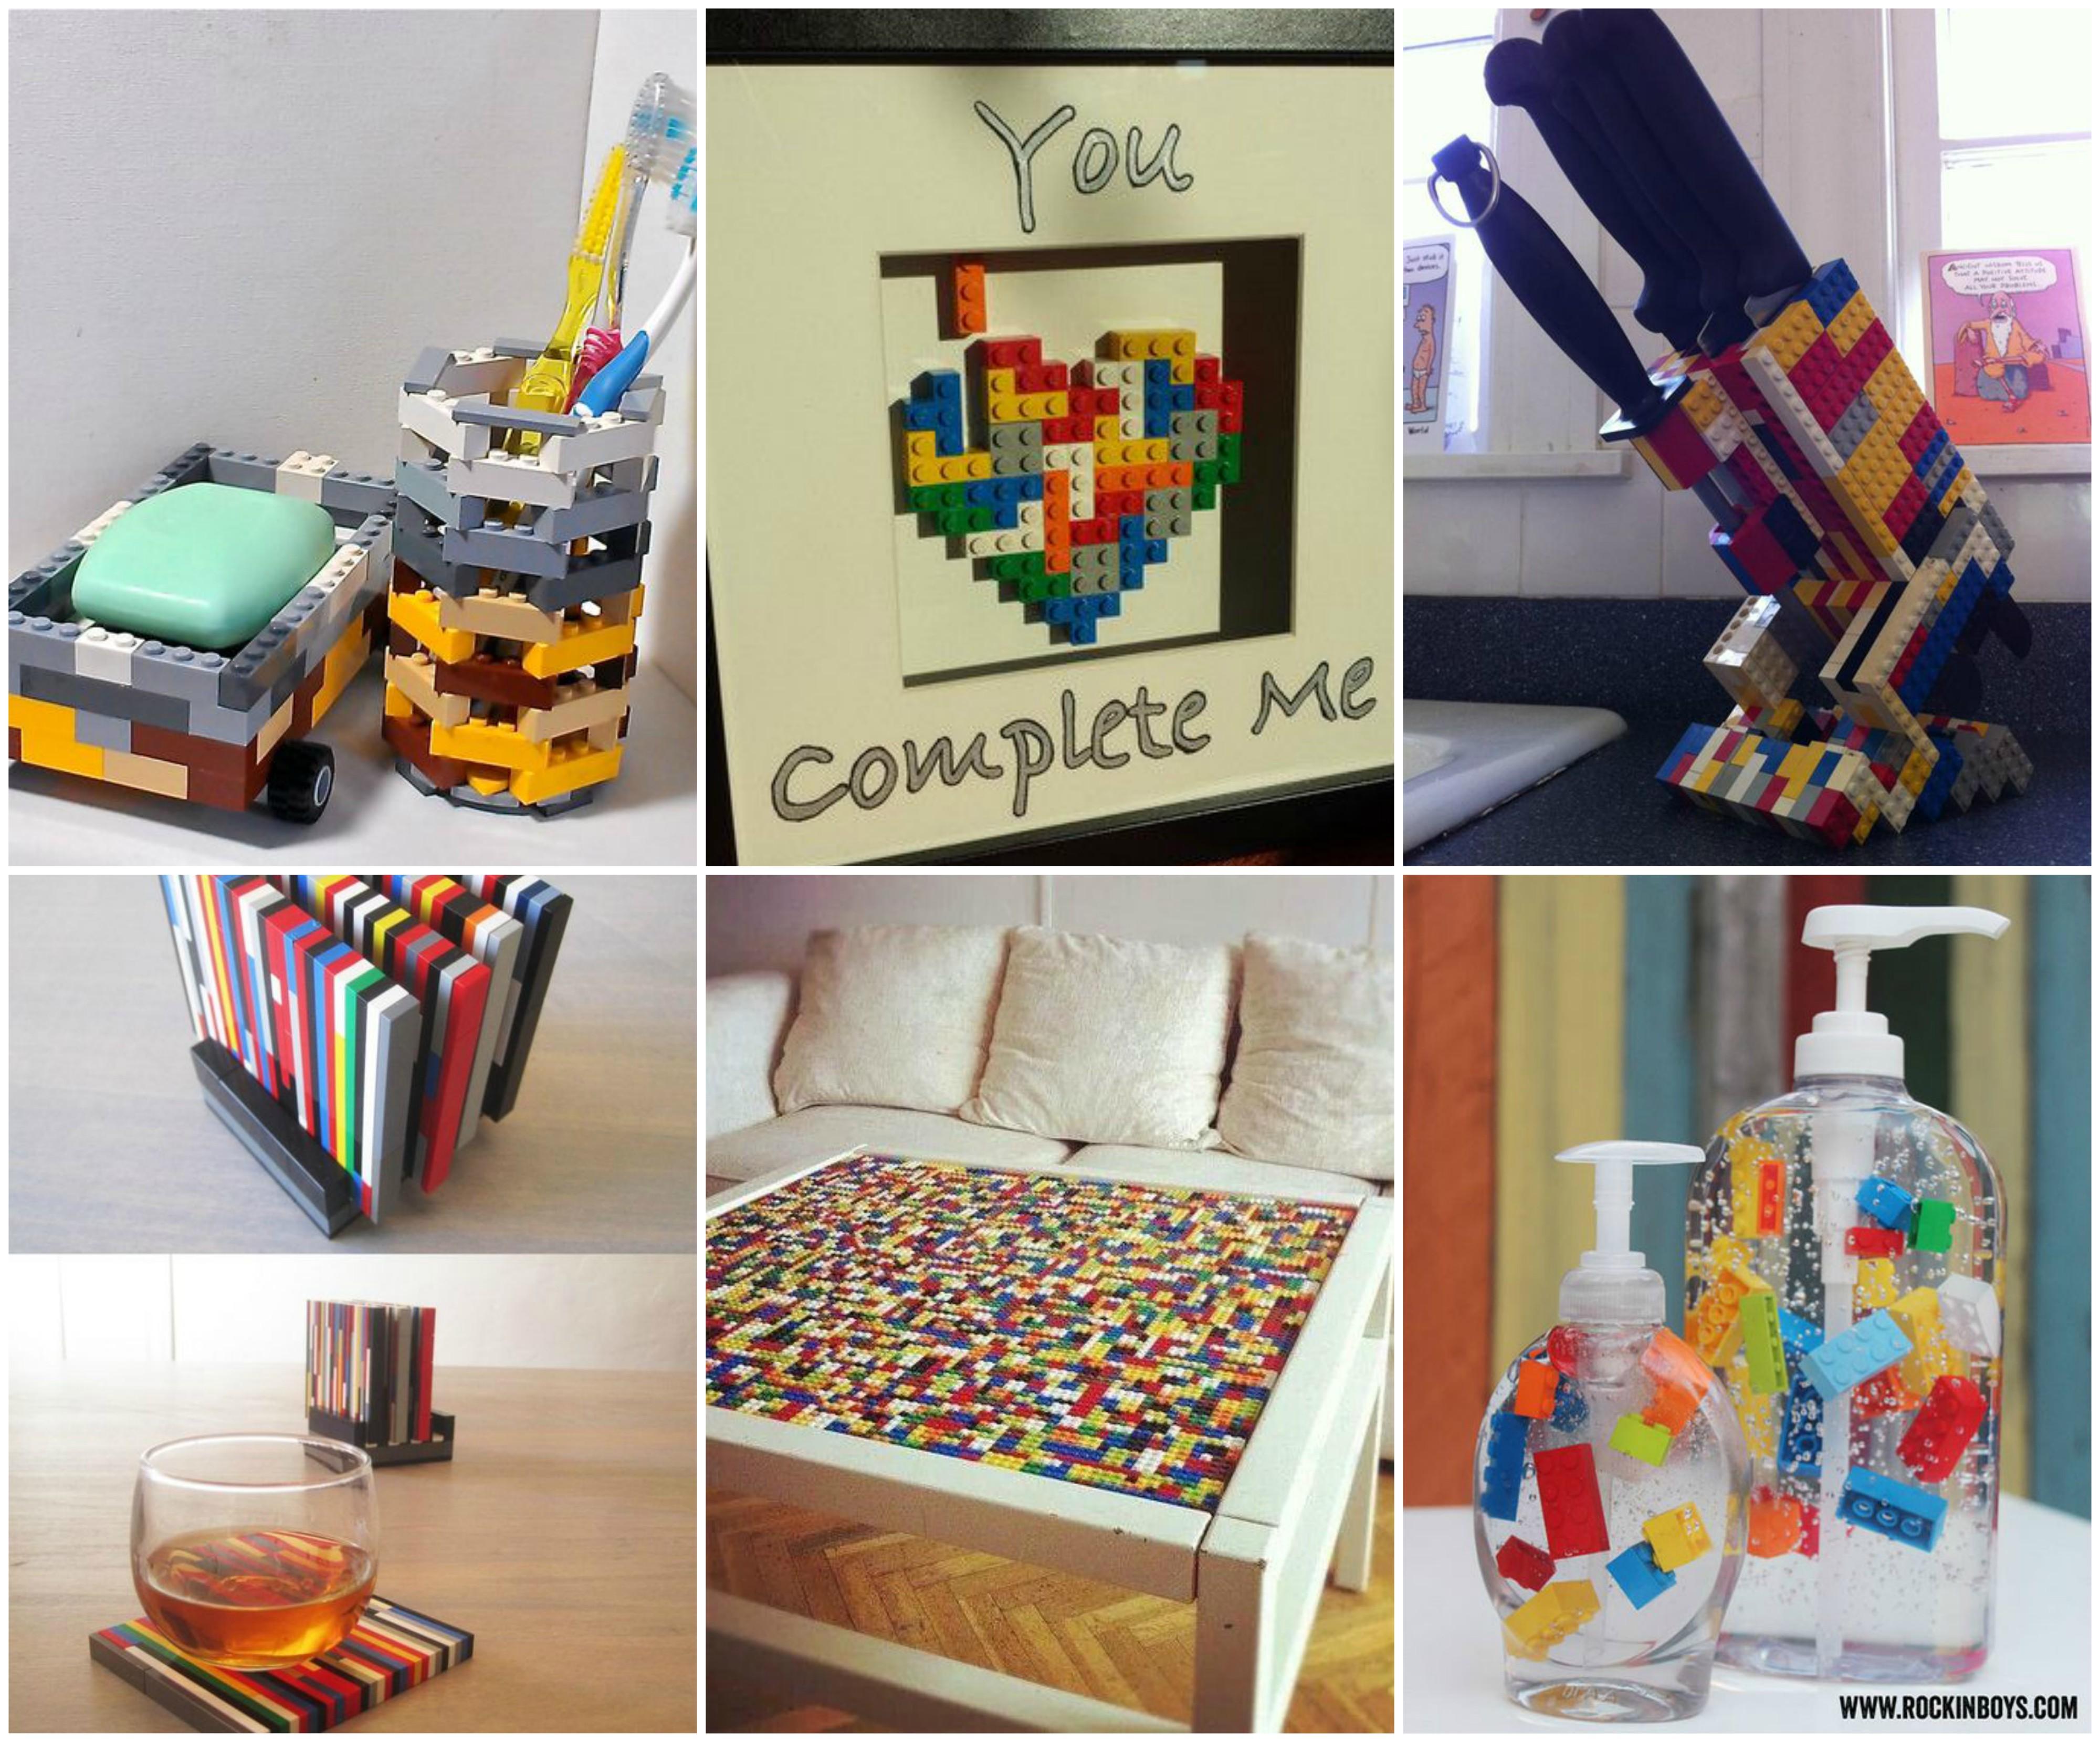 20 tolle lego bastelideen. Black Bedroom Furniture Sets. Home Design Ideas